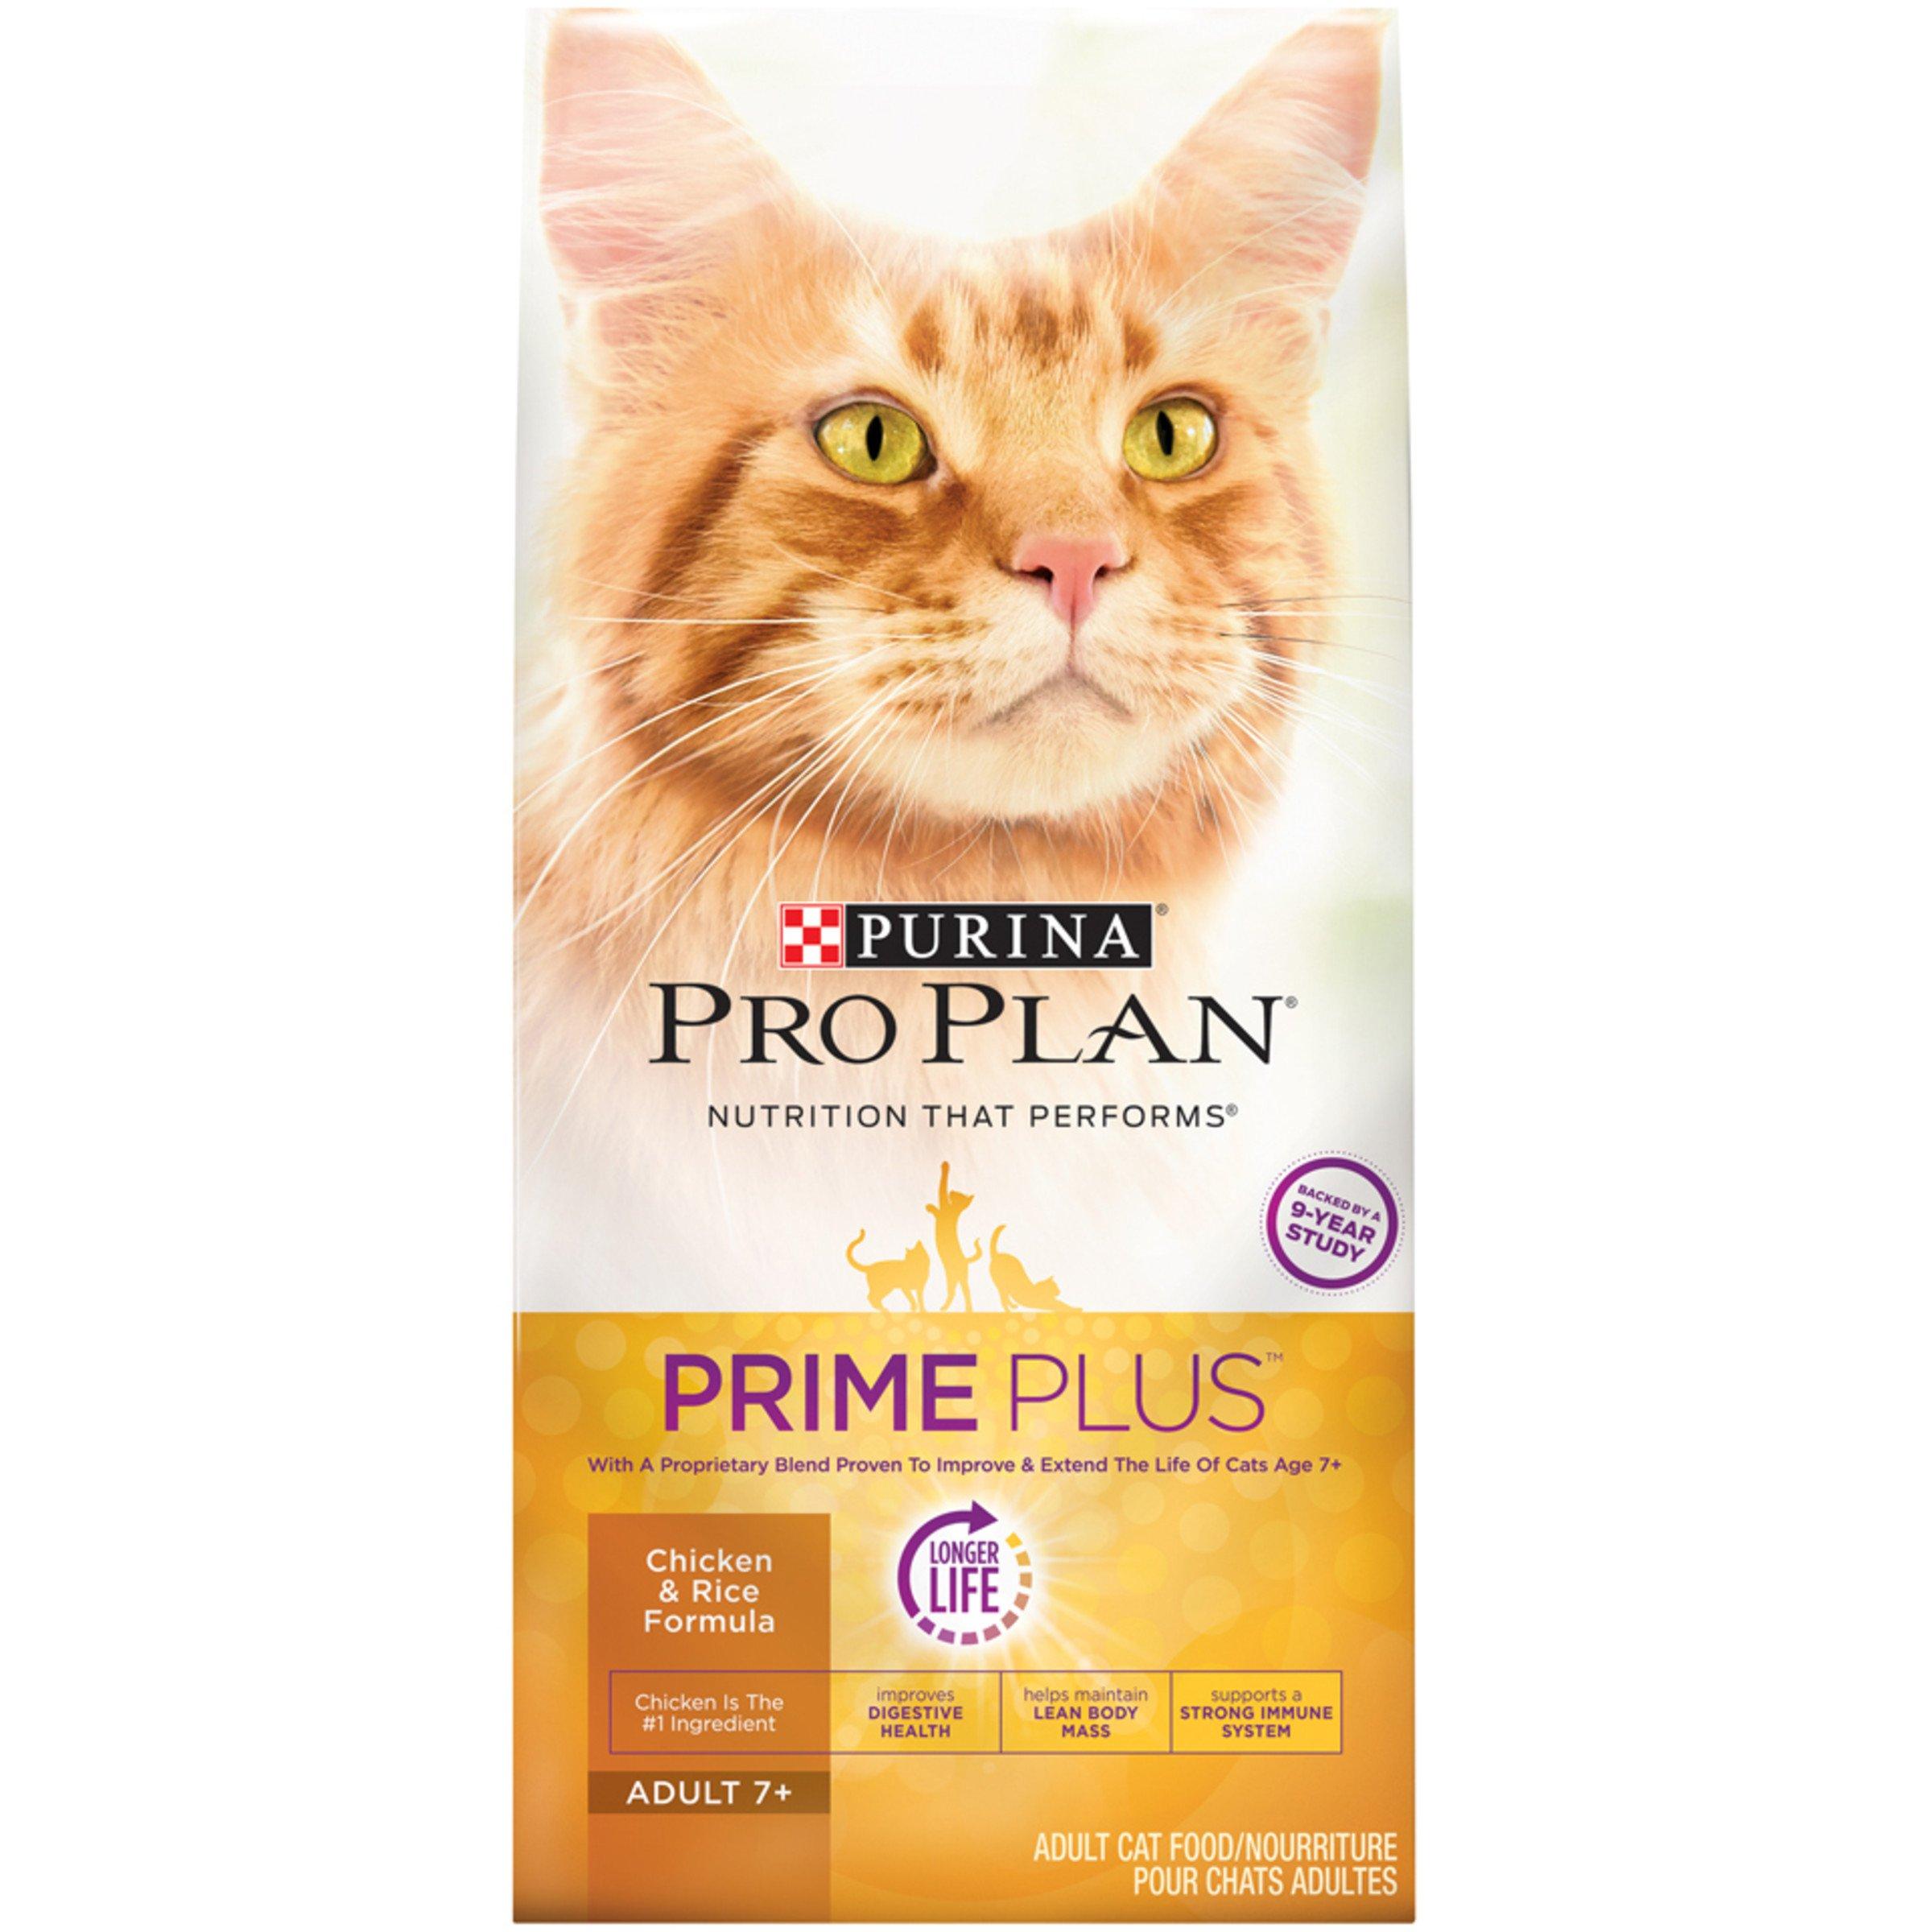 Pro Plan Dog Food Plus Adult Sensitive Digestion 25kg Free Mug Purina Prime Chicken Rice Formula Senior Bag 2400x2400